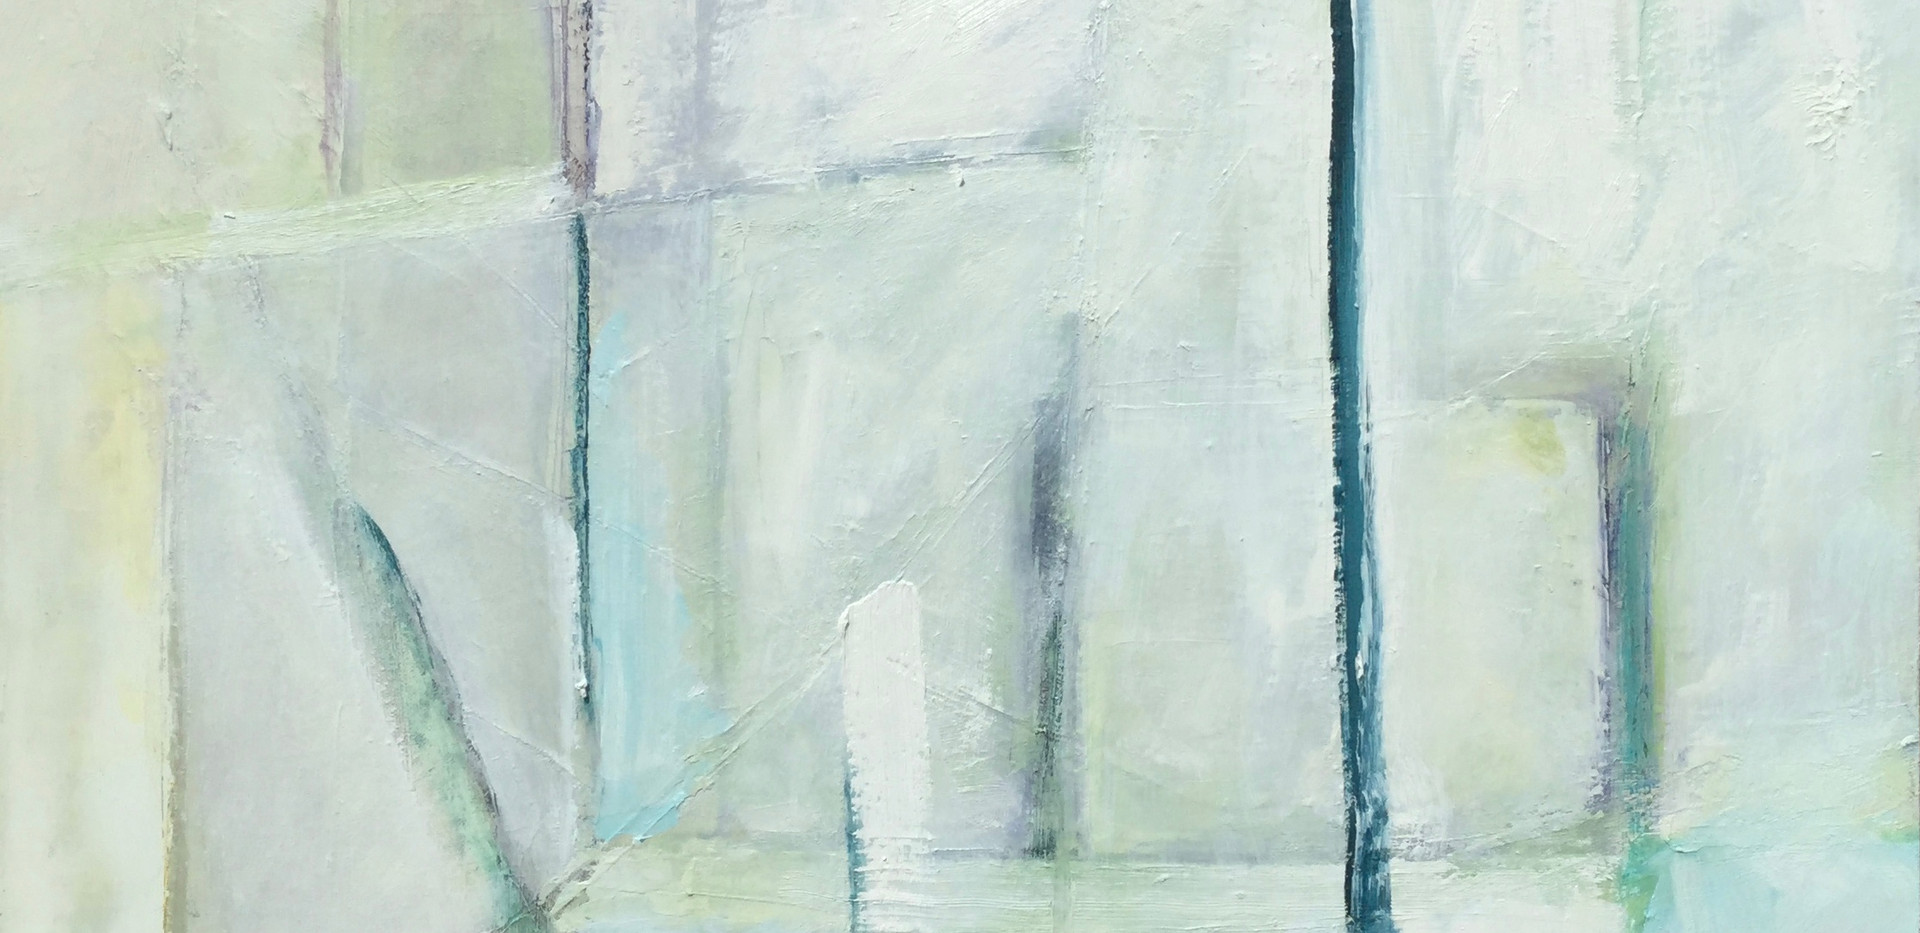 White Composition #1